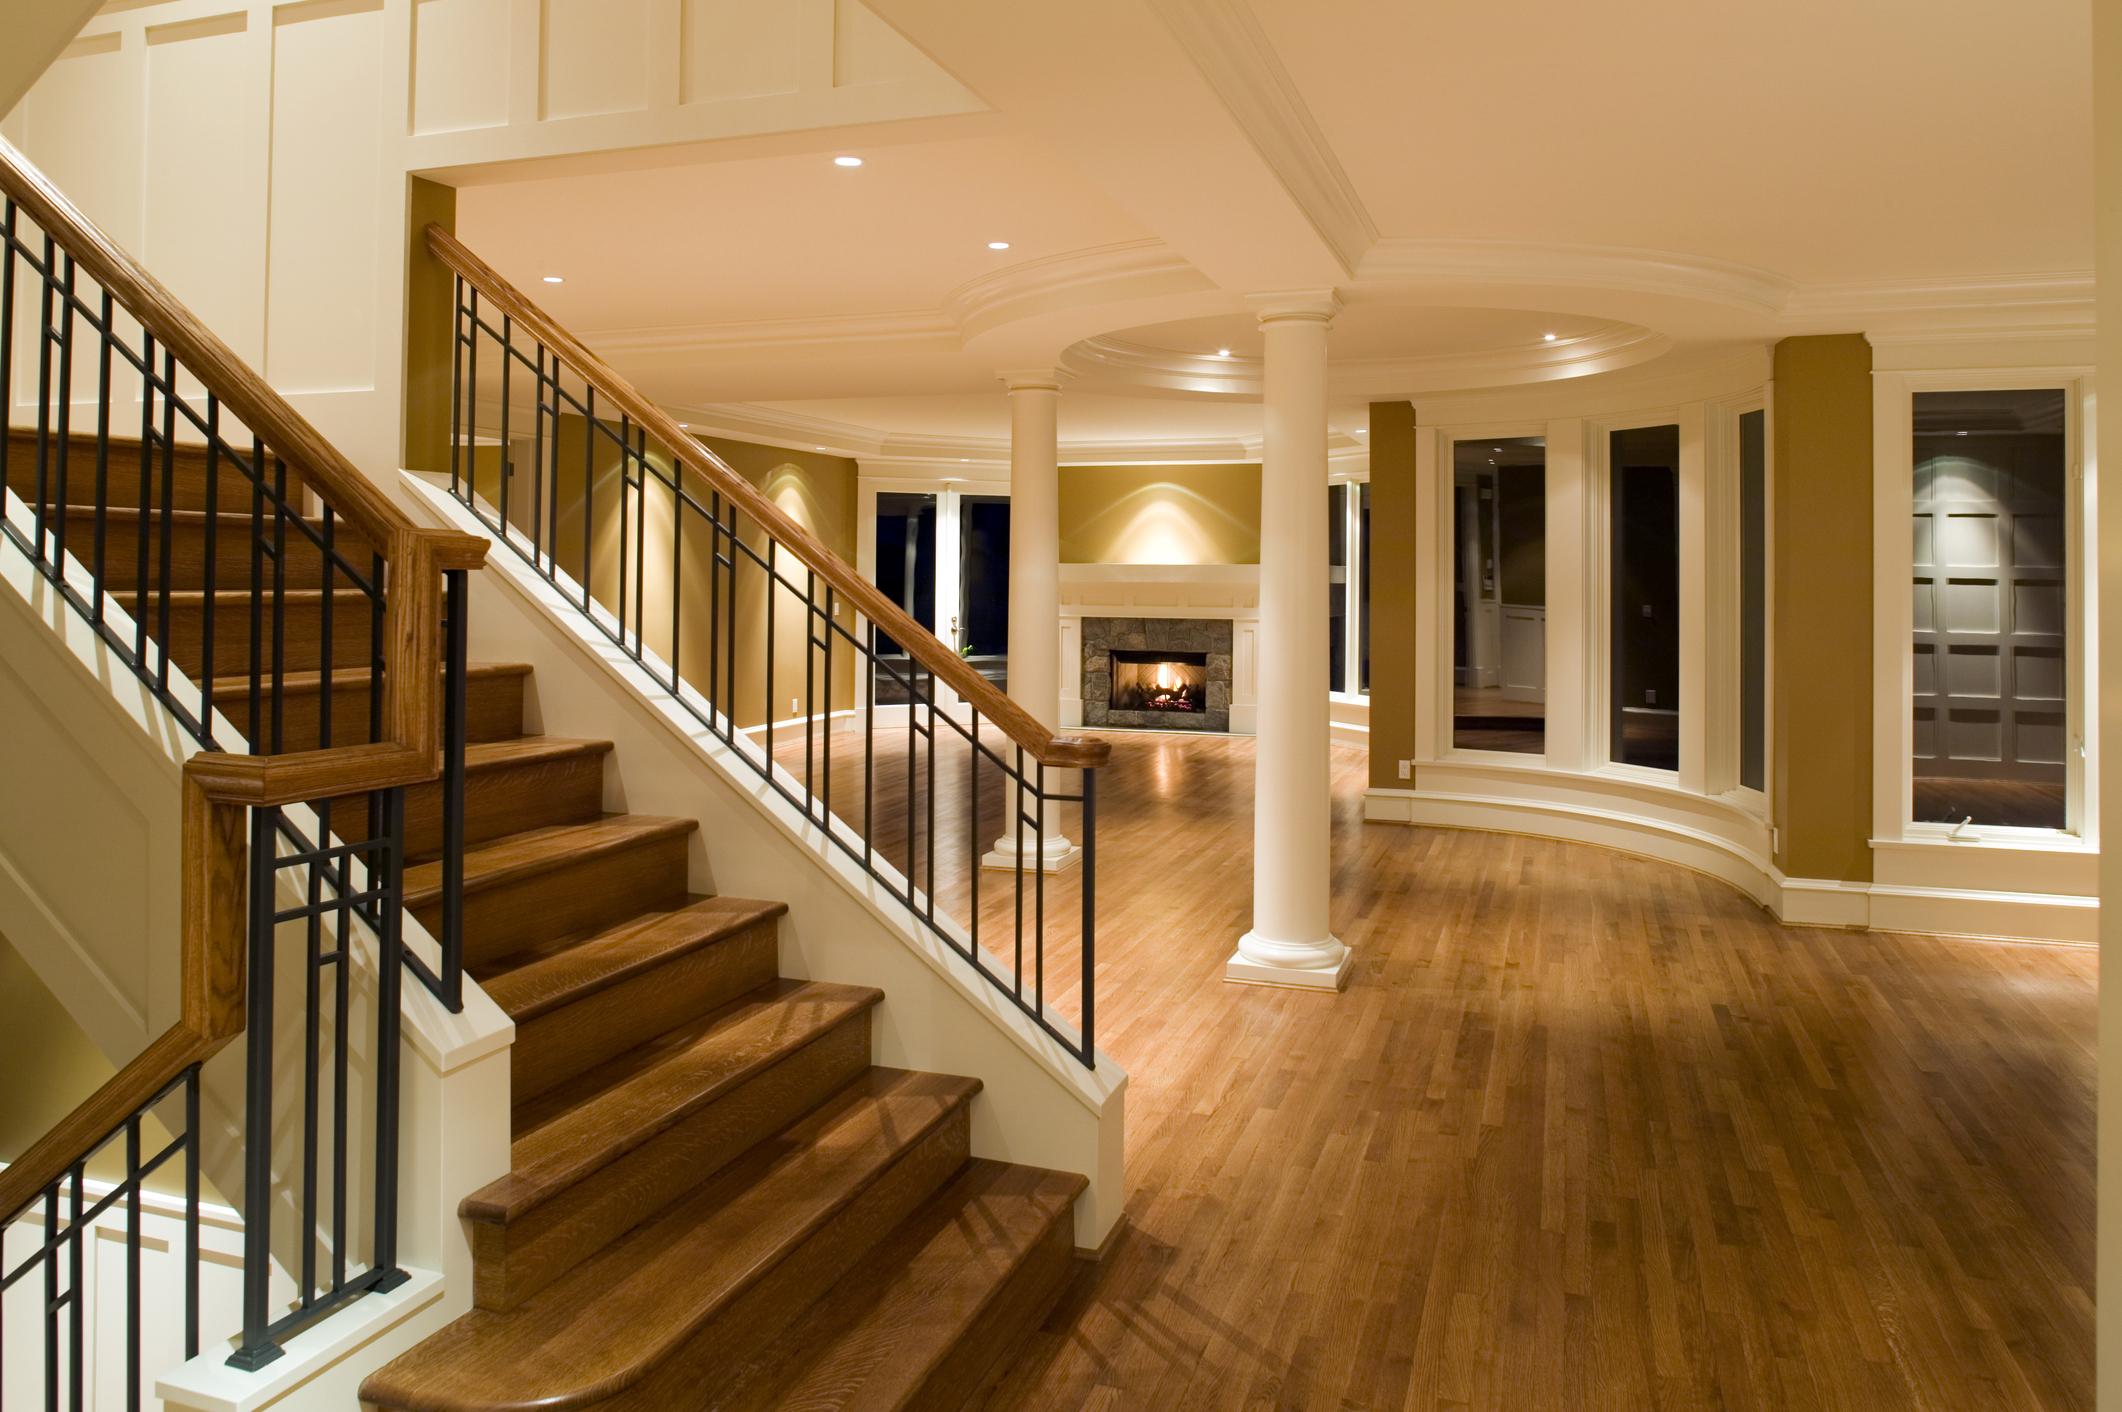 interior unfurnished luxury home